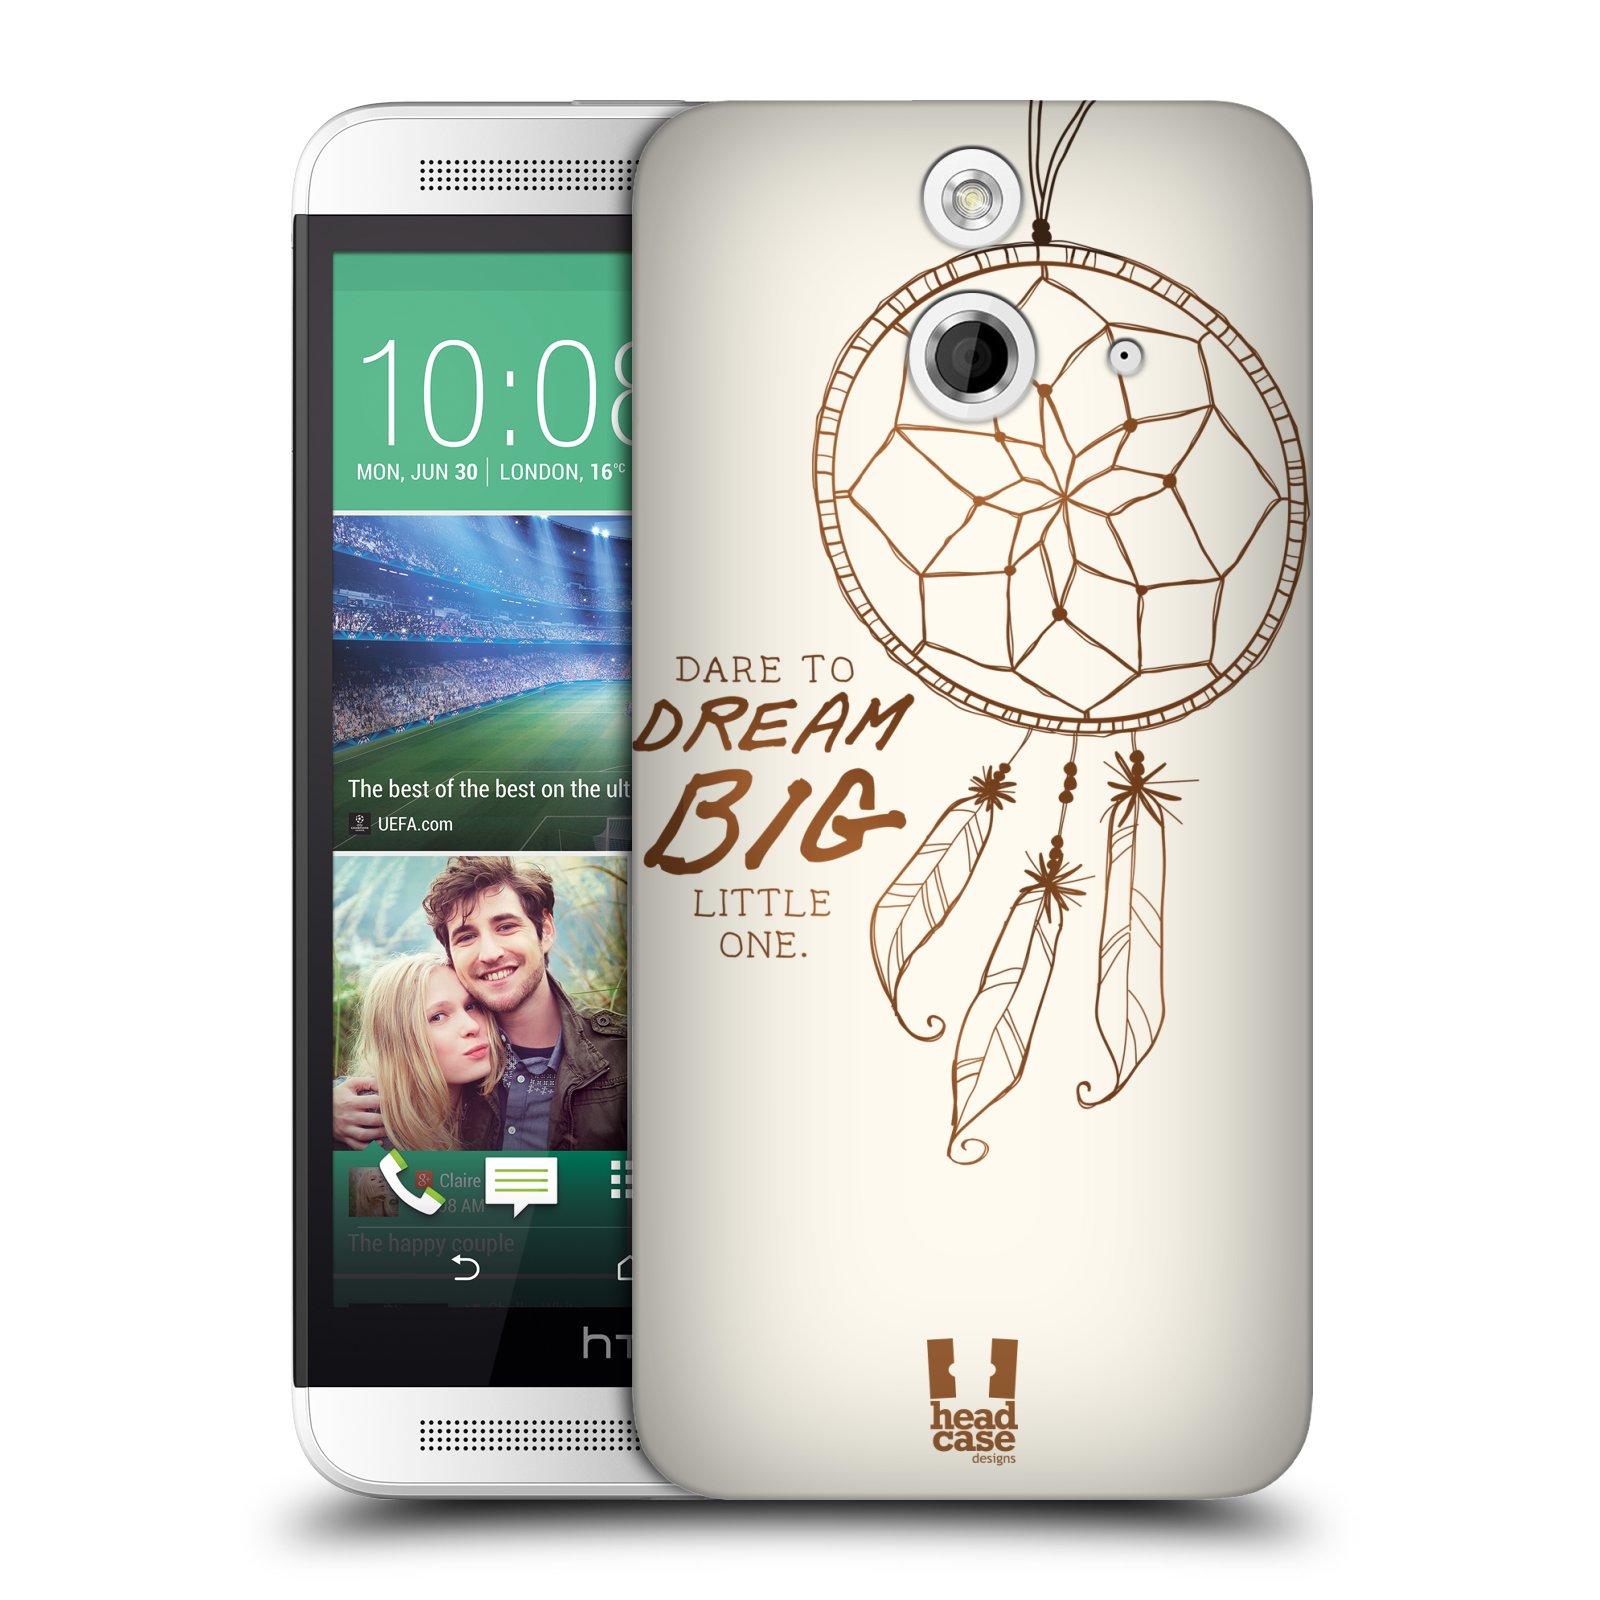 HEAD CASE DESIGNS DREAMCATCHERS SERIES 1 HARD BACK CASE FOR HTC ONE E8 DUAL SIM